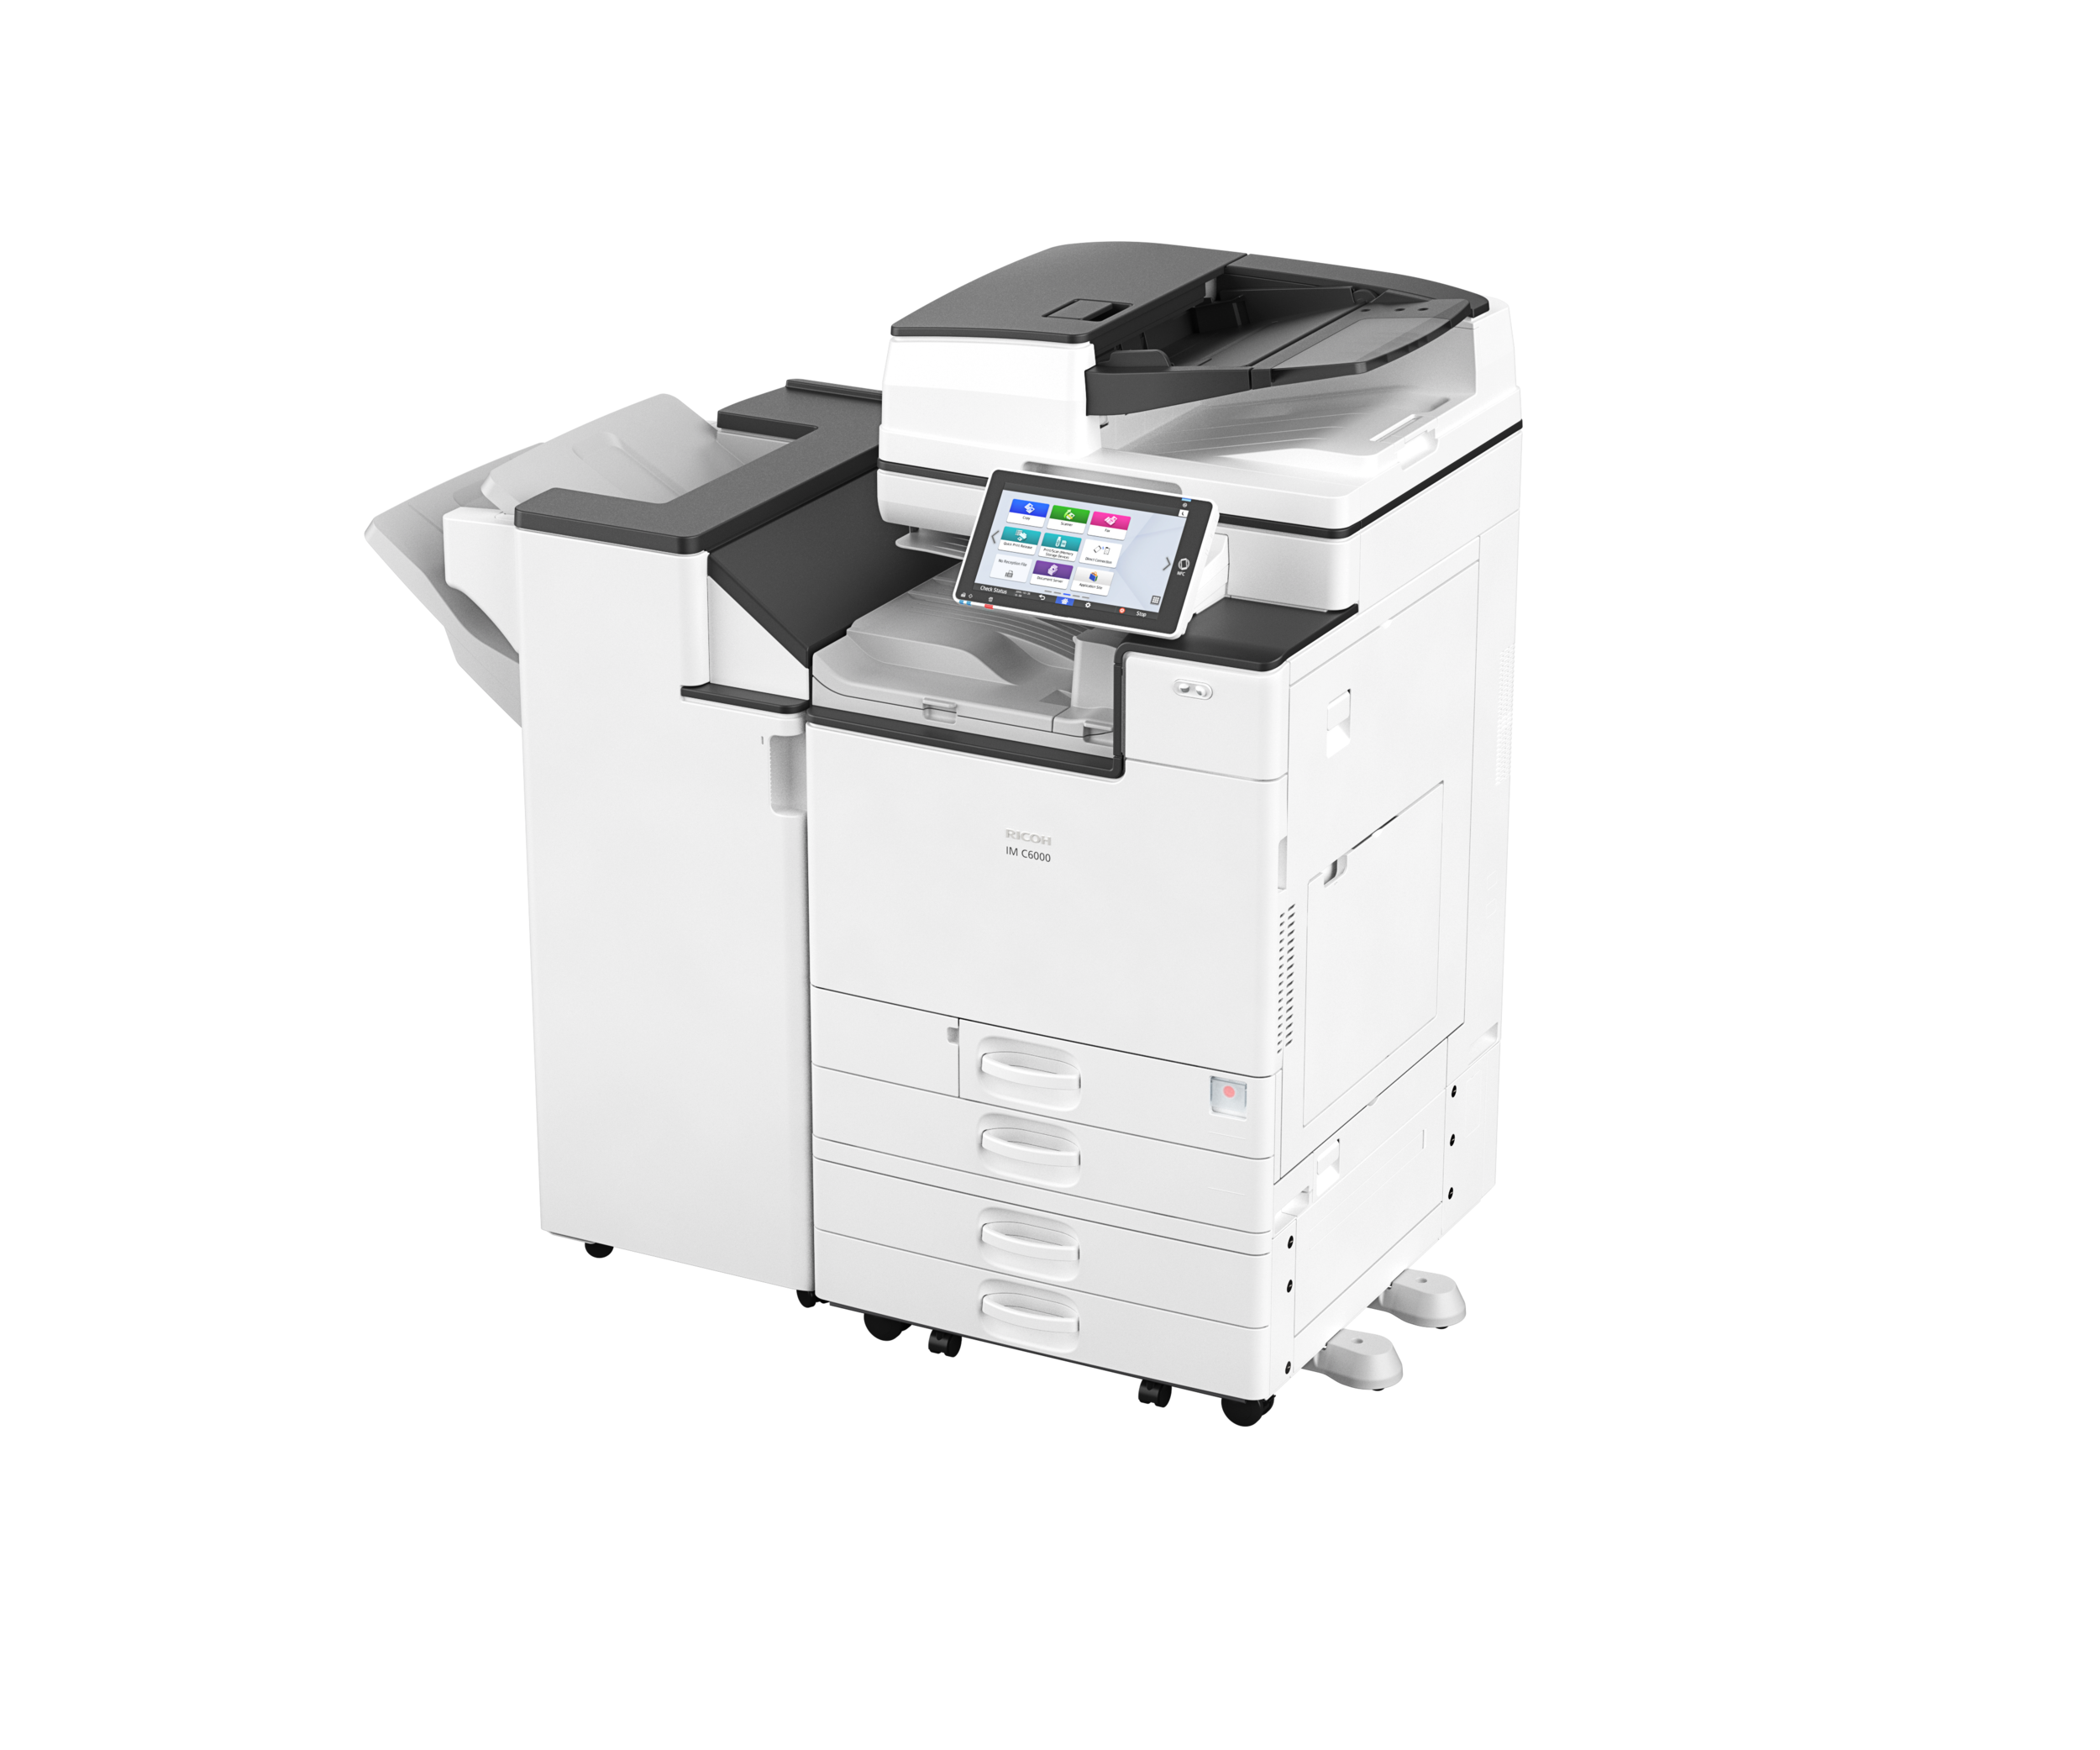 RICOH_IM_C6000_printer_copier_long_island_new_york.png